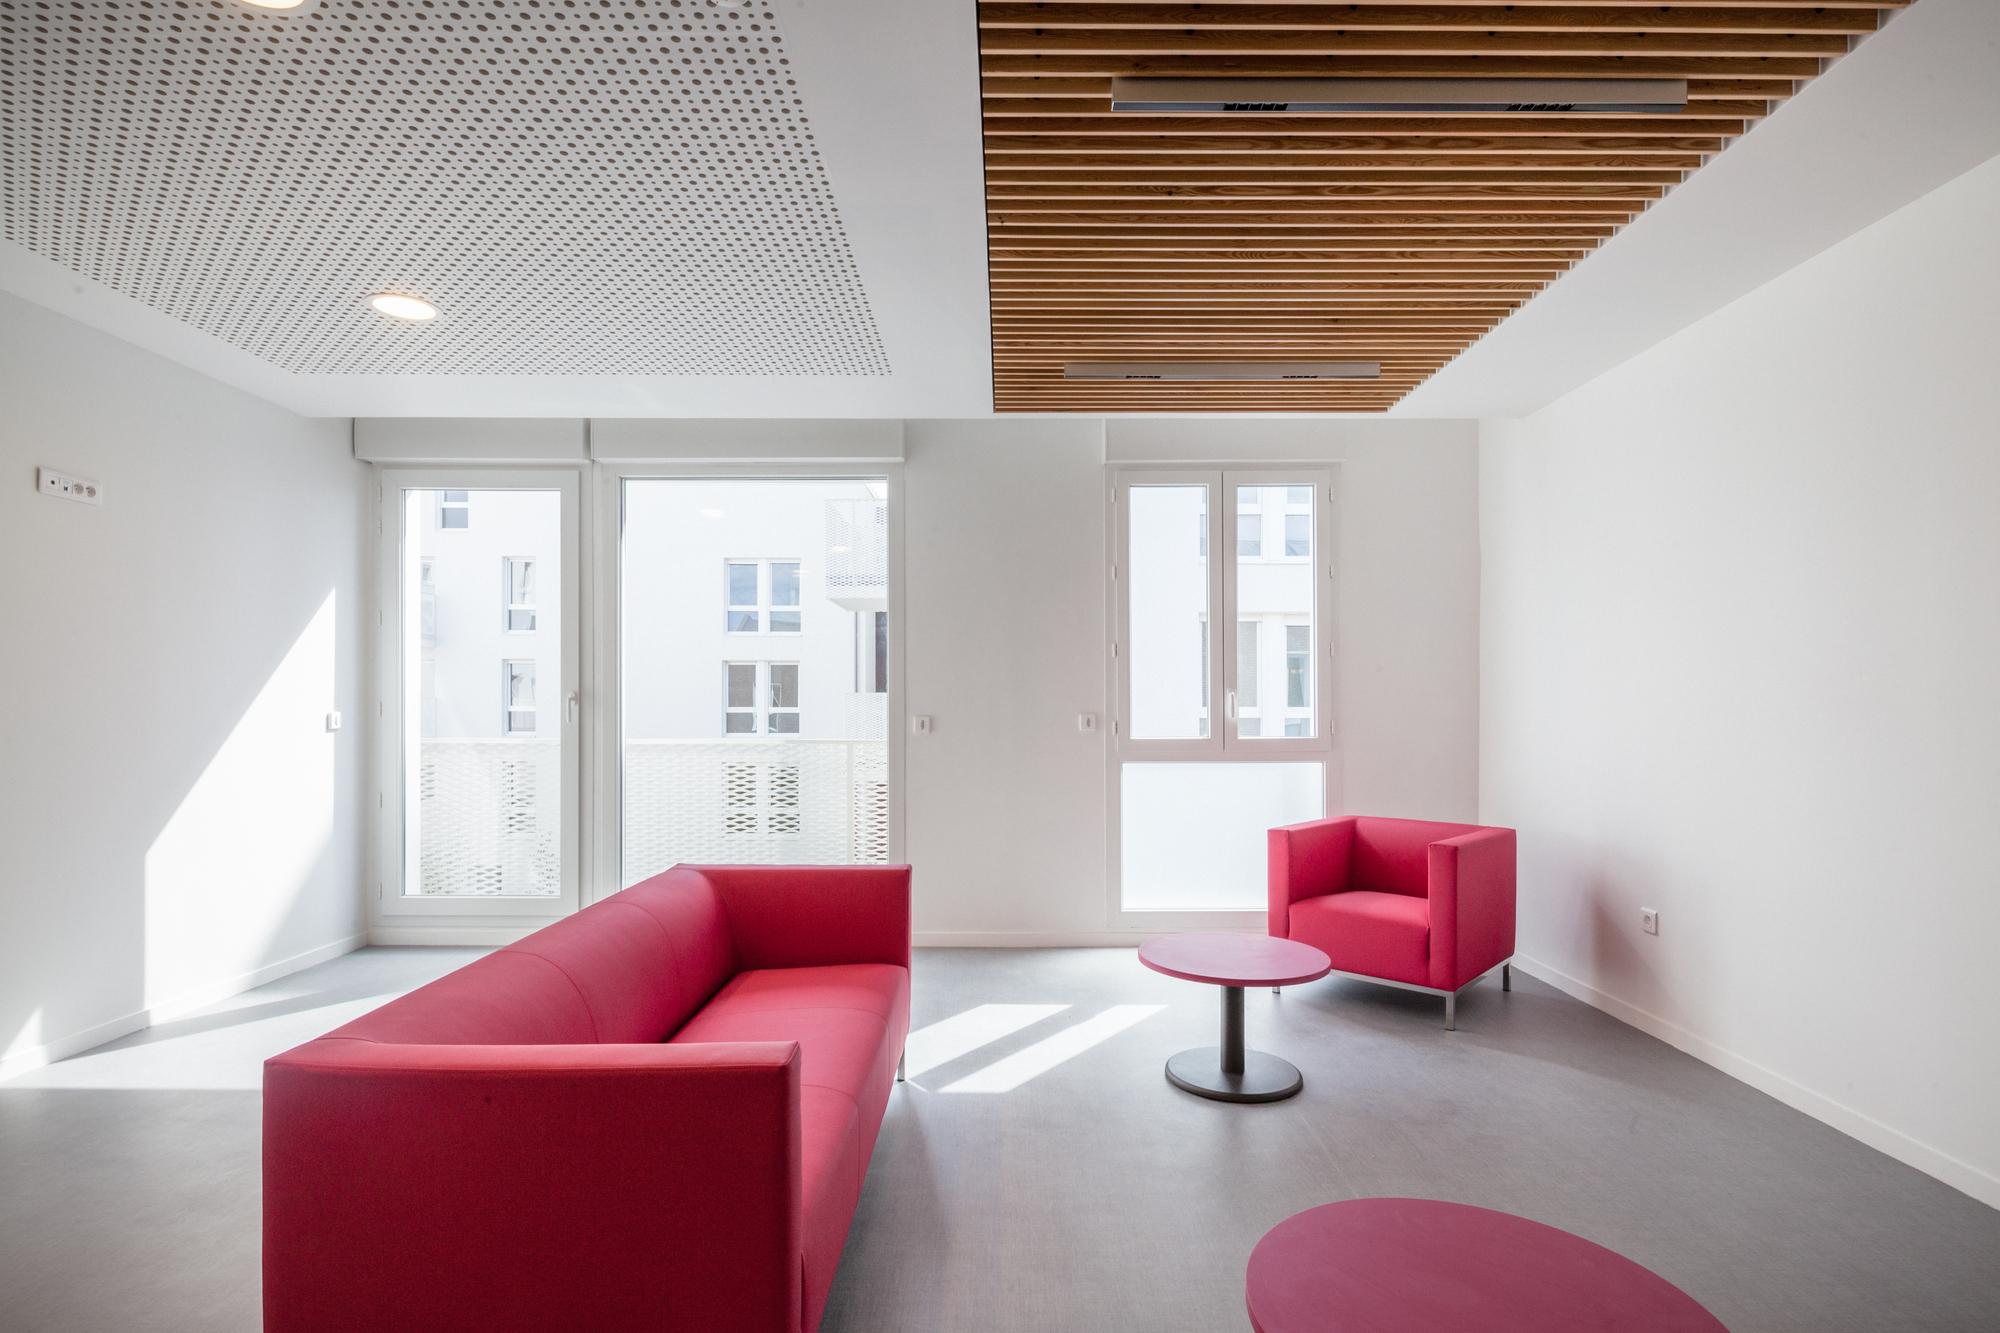 gallery of vigneux sur seine housing margot duclot architectes associ s 5. Black Bedroom Furniture Sets. Home Design Ideas